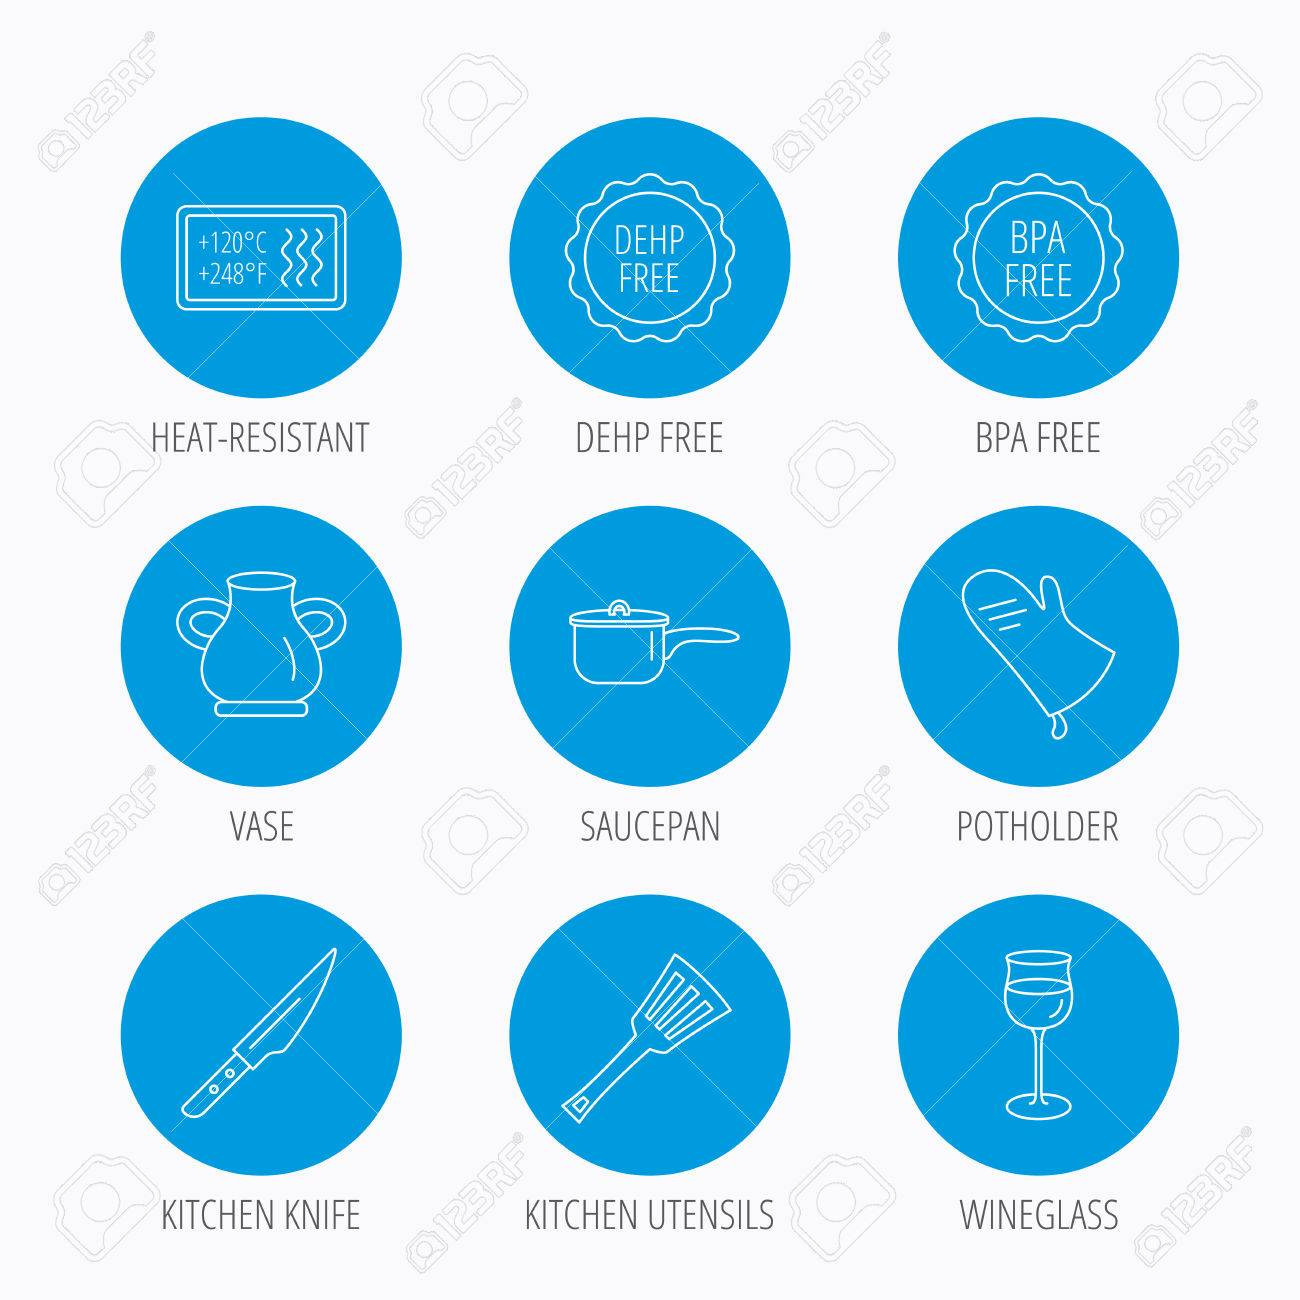 Saucepan, Potholder And Wineglass Icons. Kitchen Knife, Utensils ...